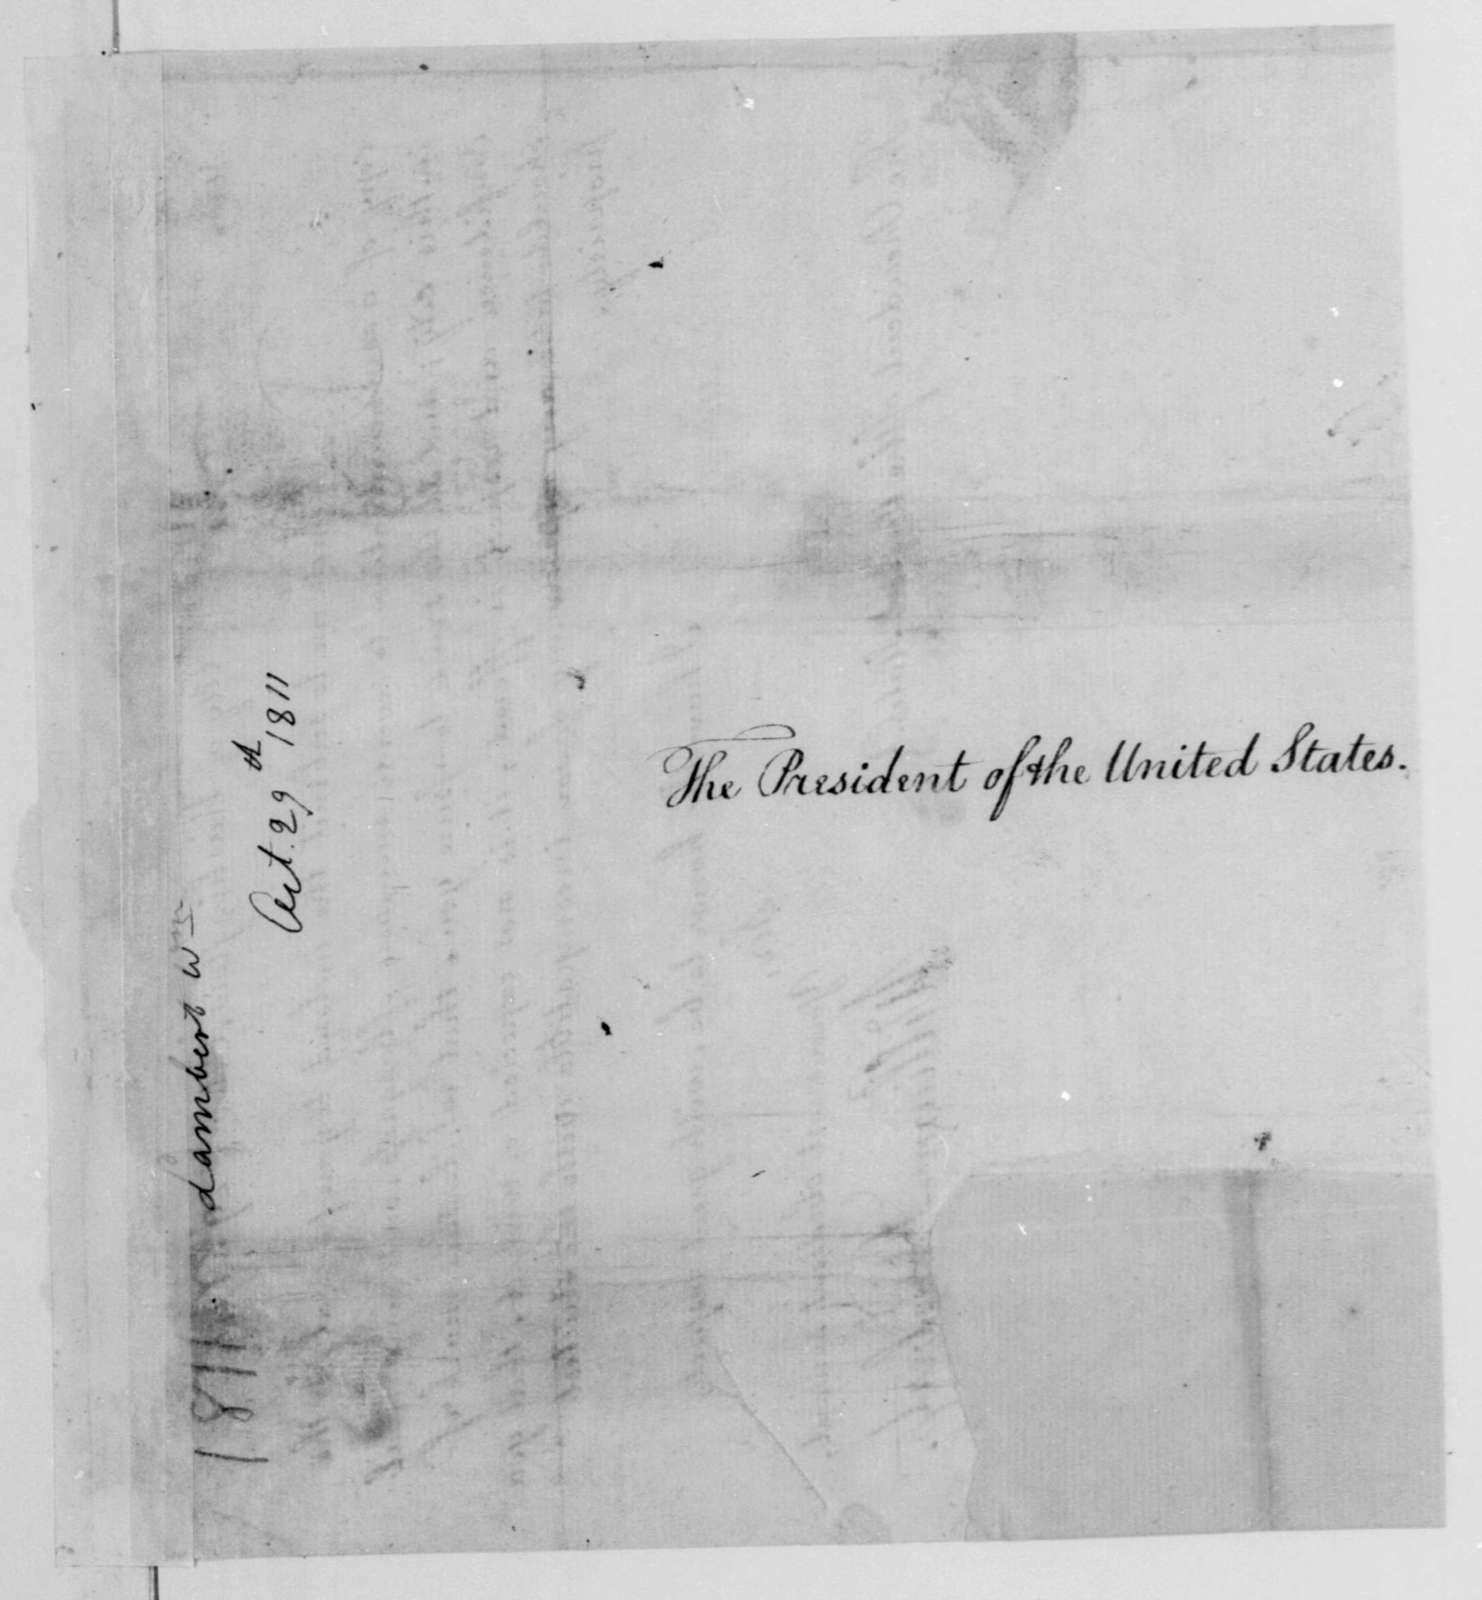 William Lambert to James Madison, October 29, 1811.